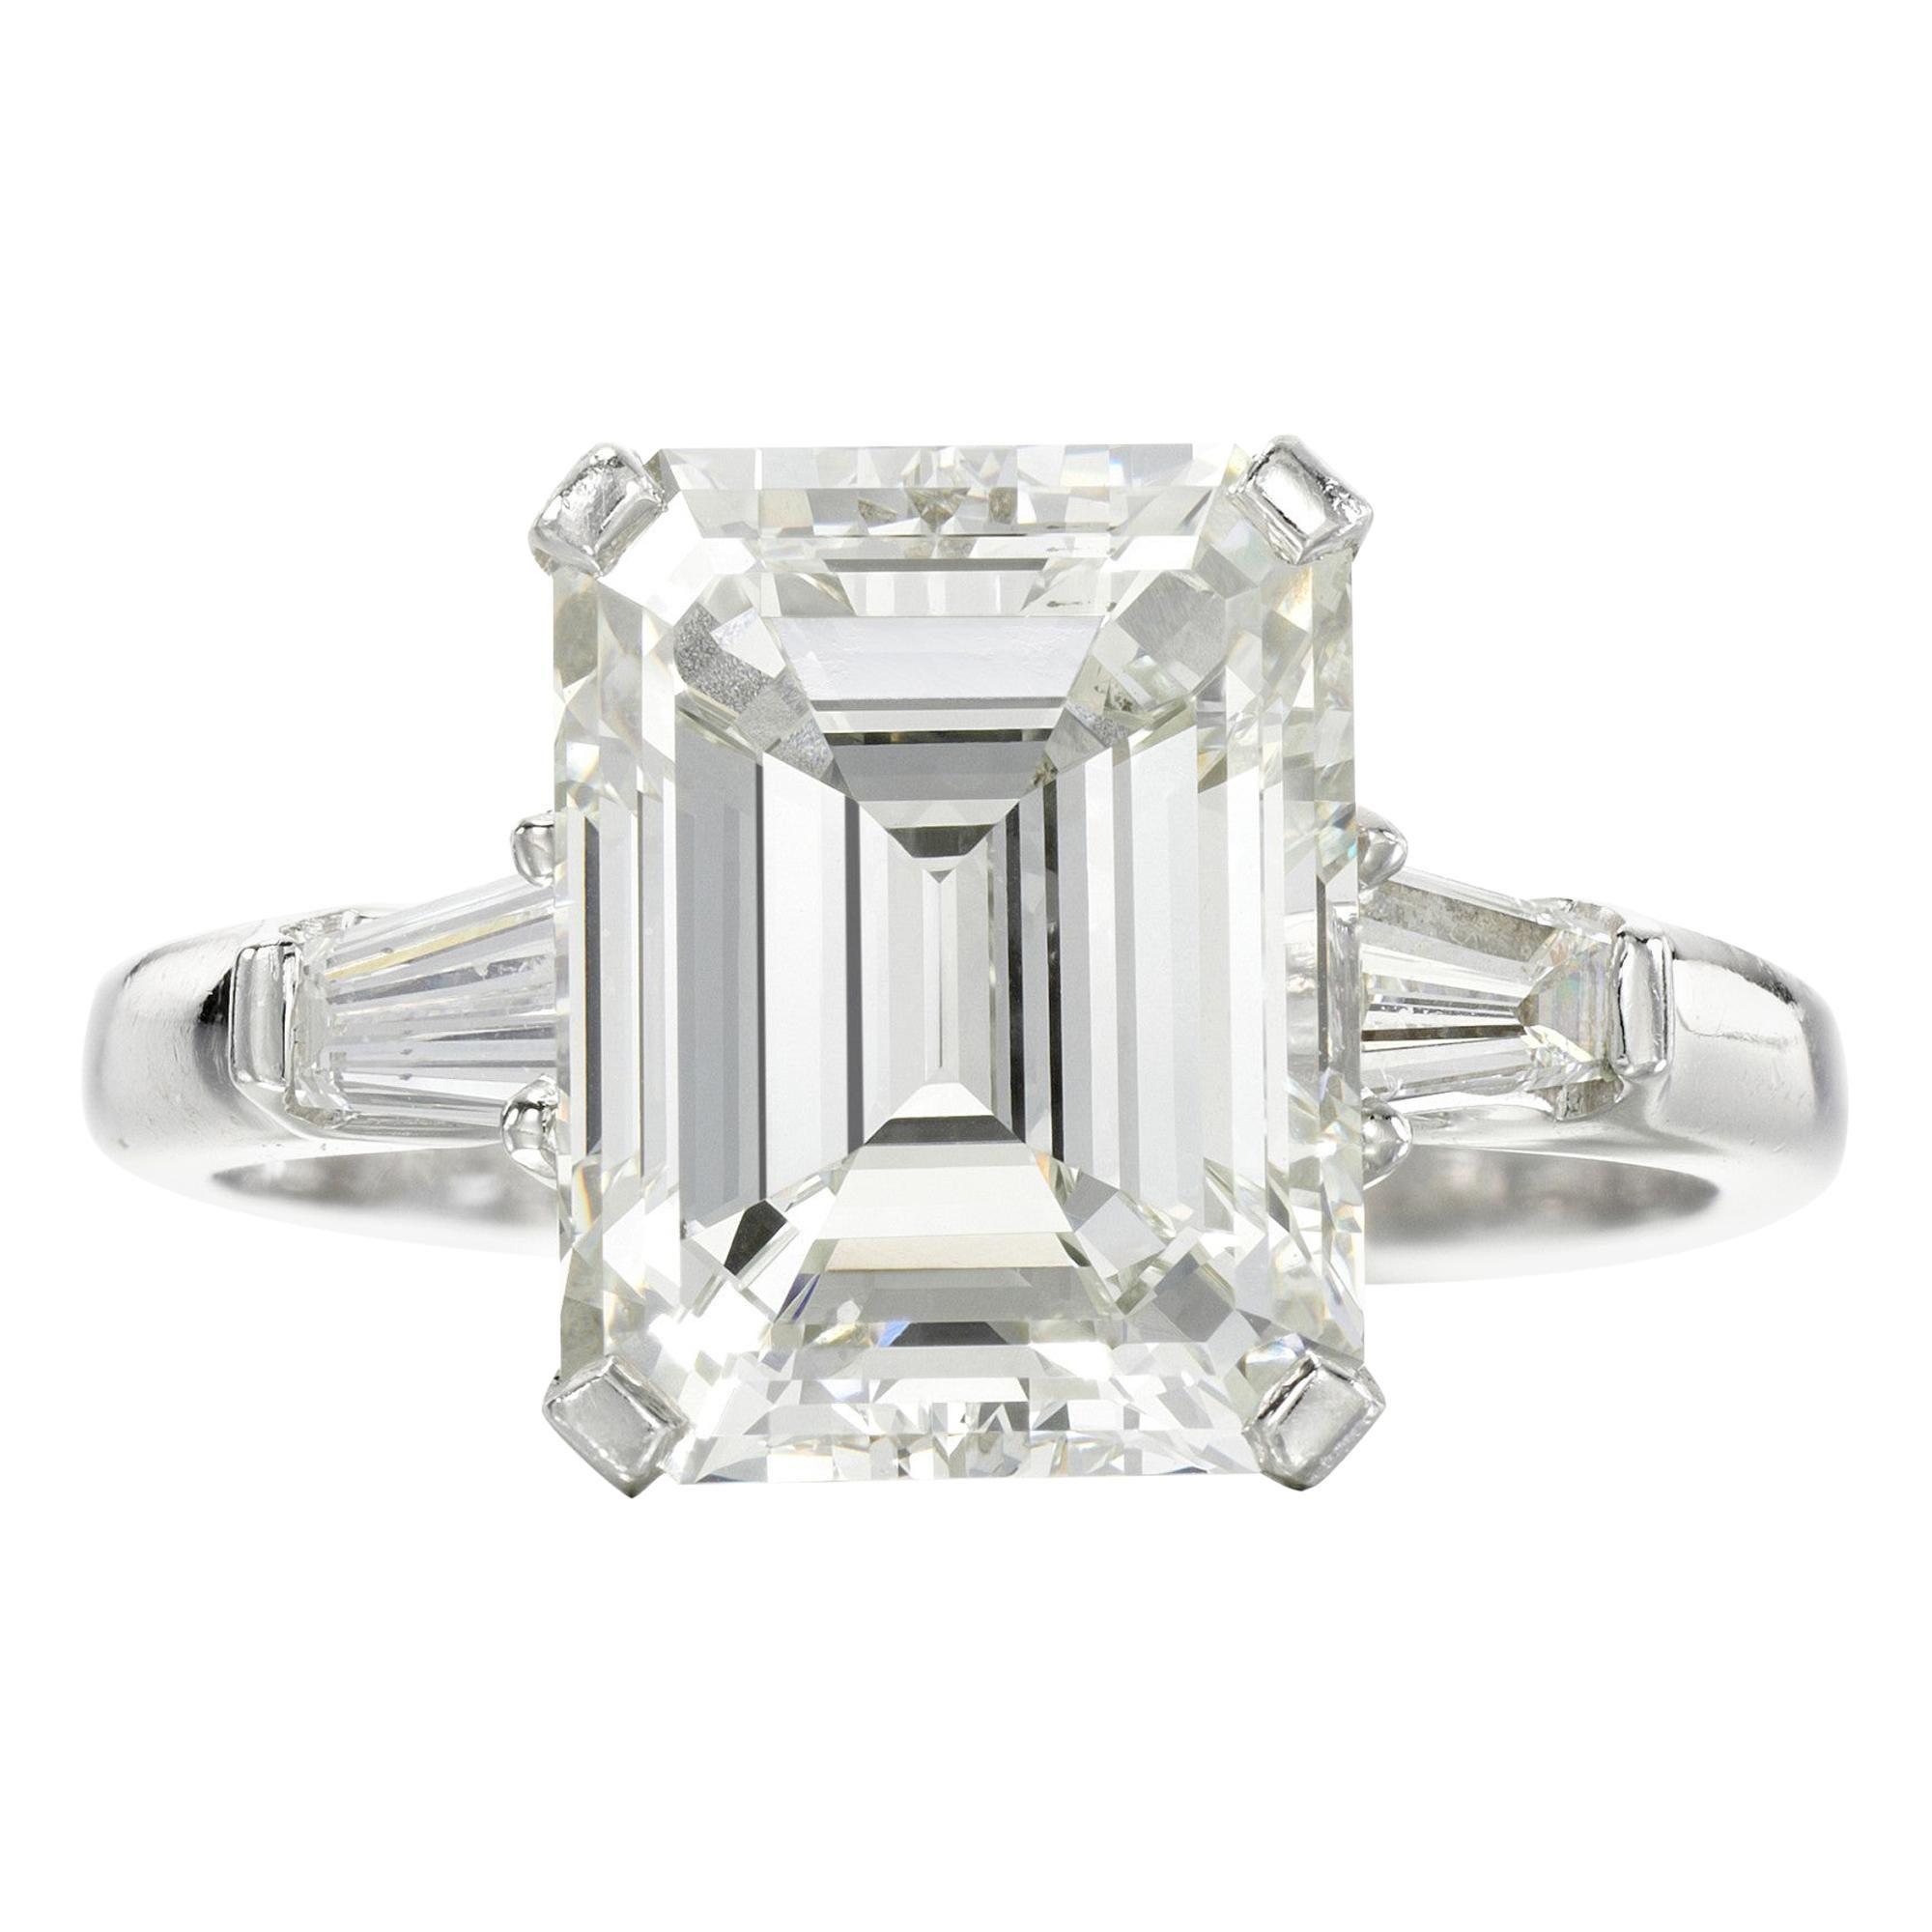 GIA Certified 2.21 Carat Emerald Cut Diamond Ring VVS1 Clarity